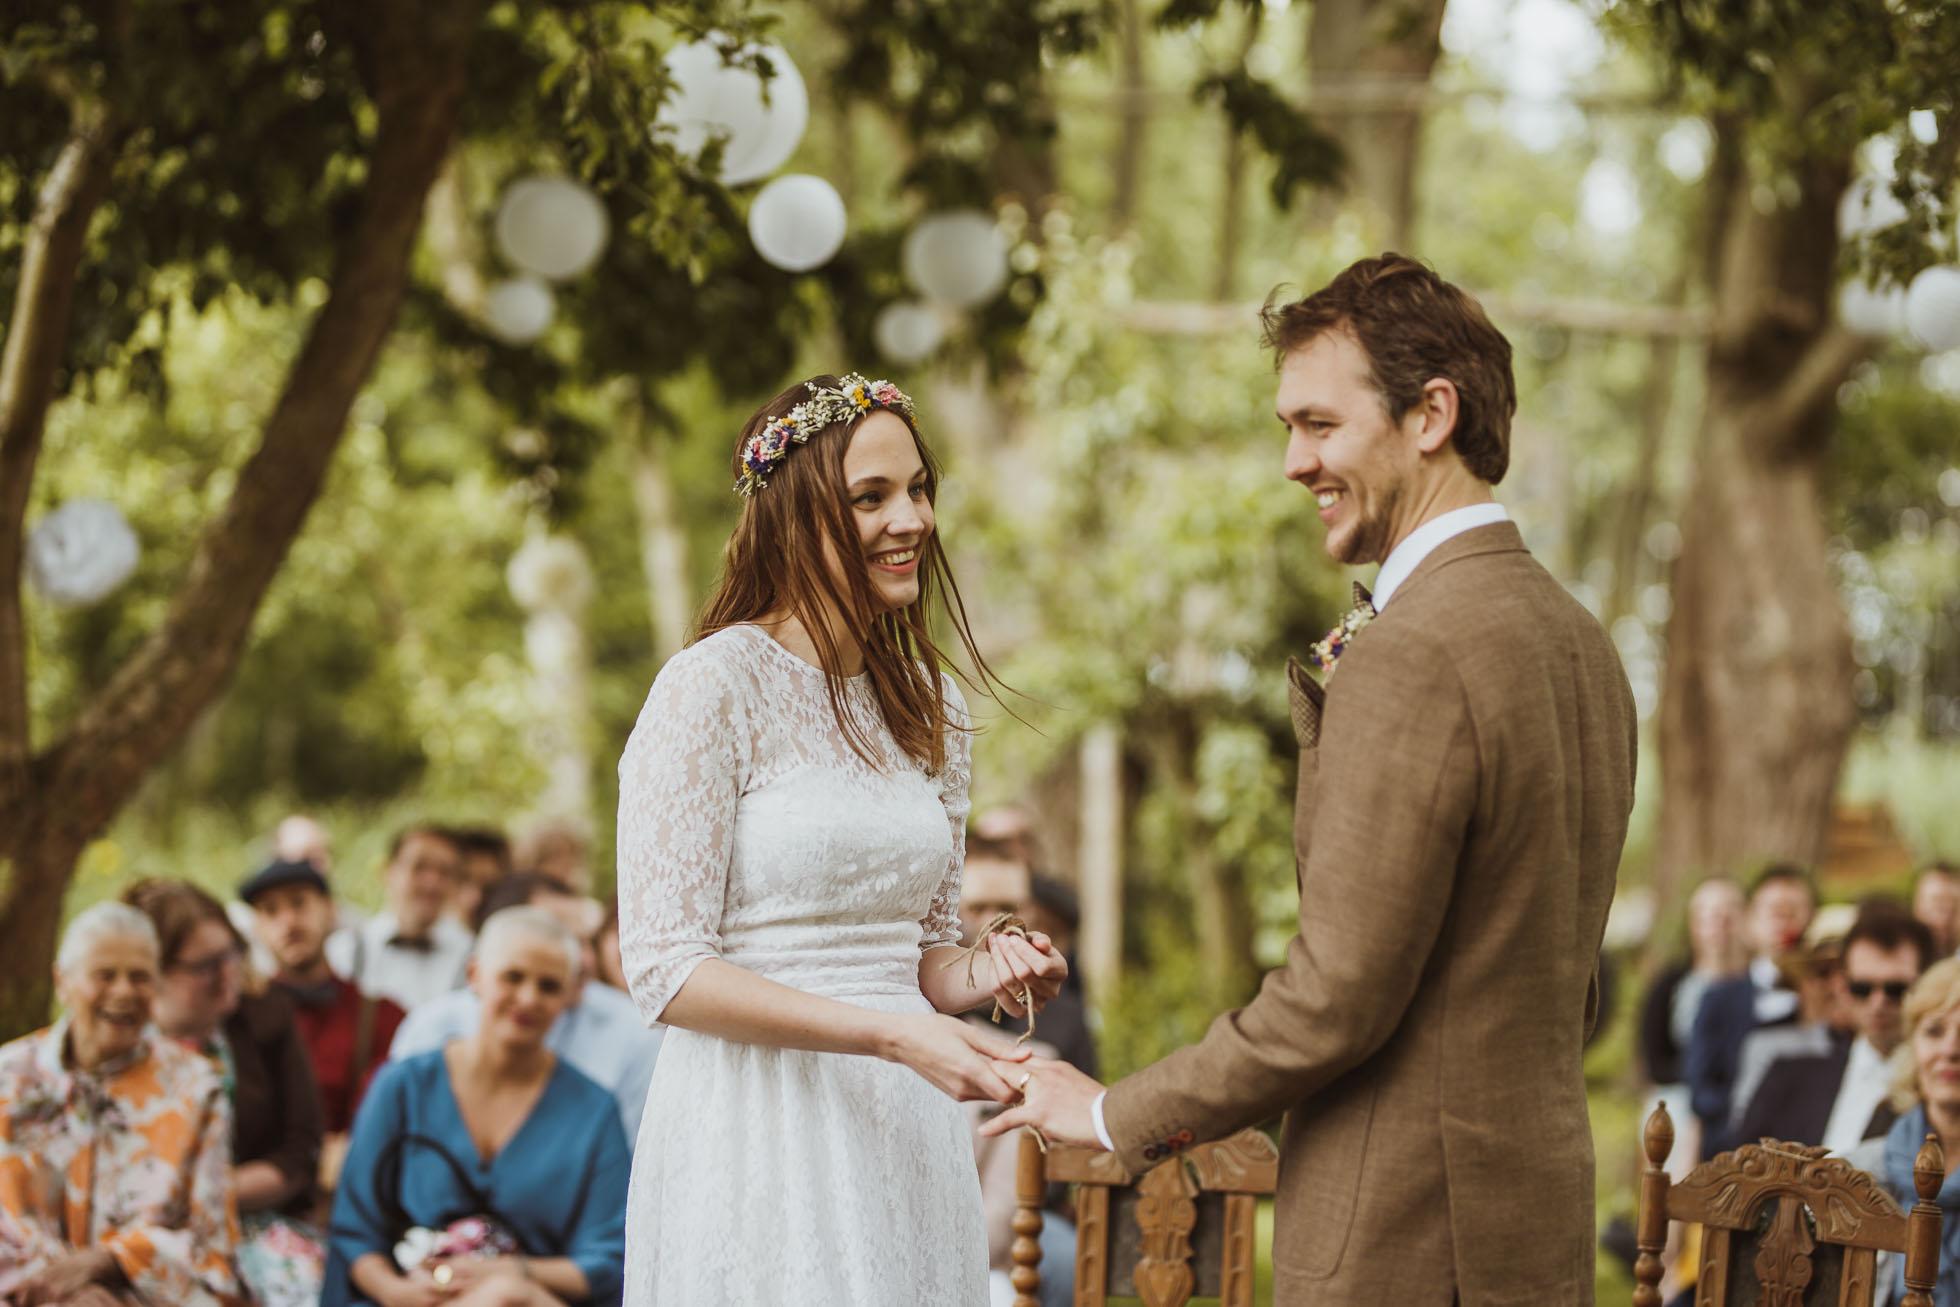 utrecht-wedding-photographer-72.jpg